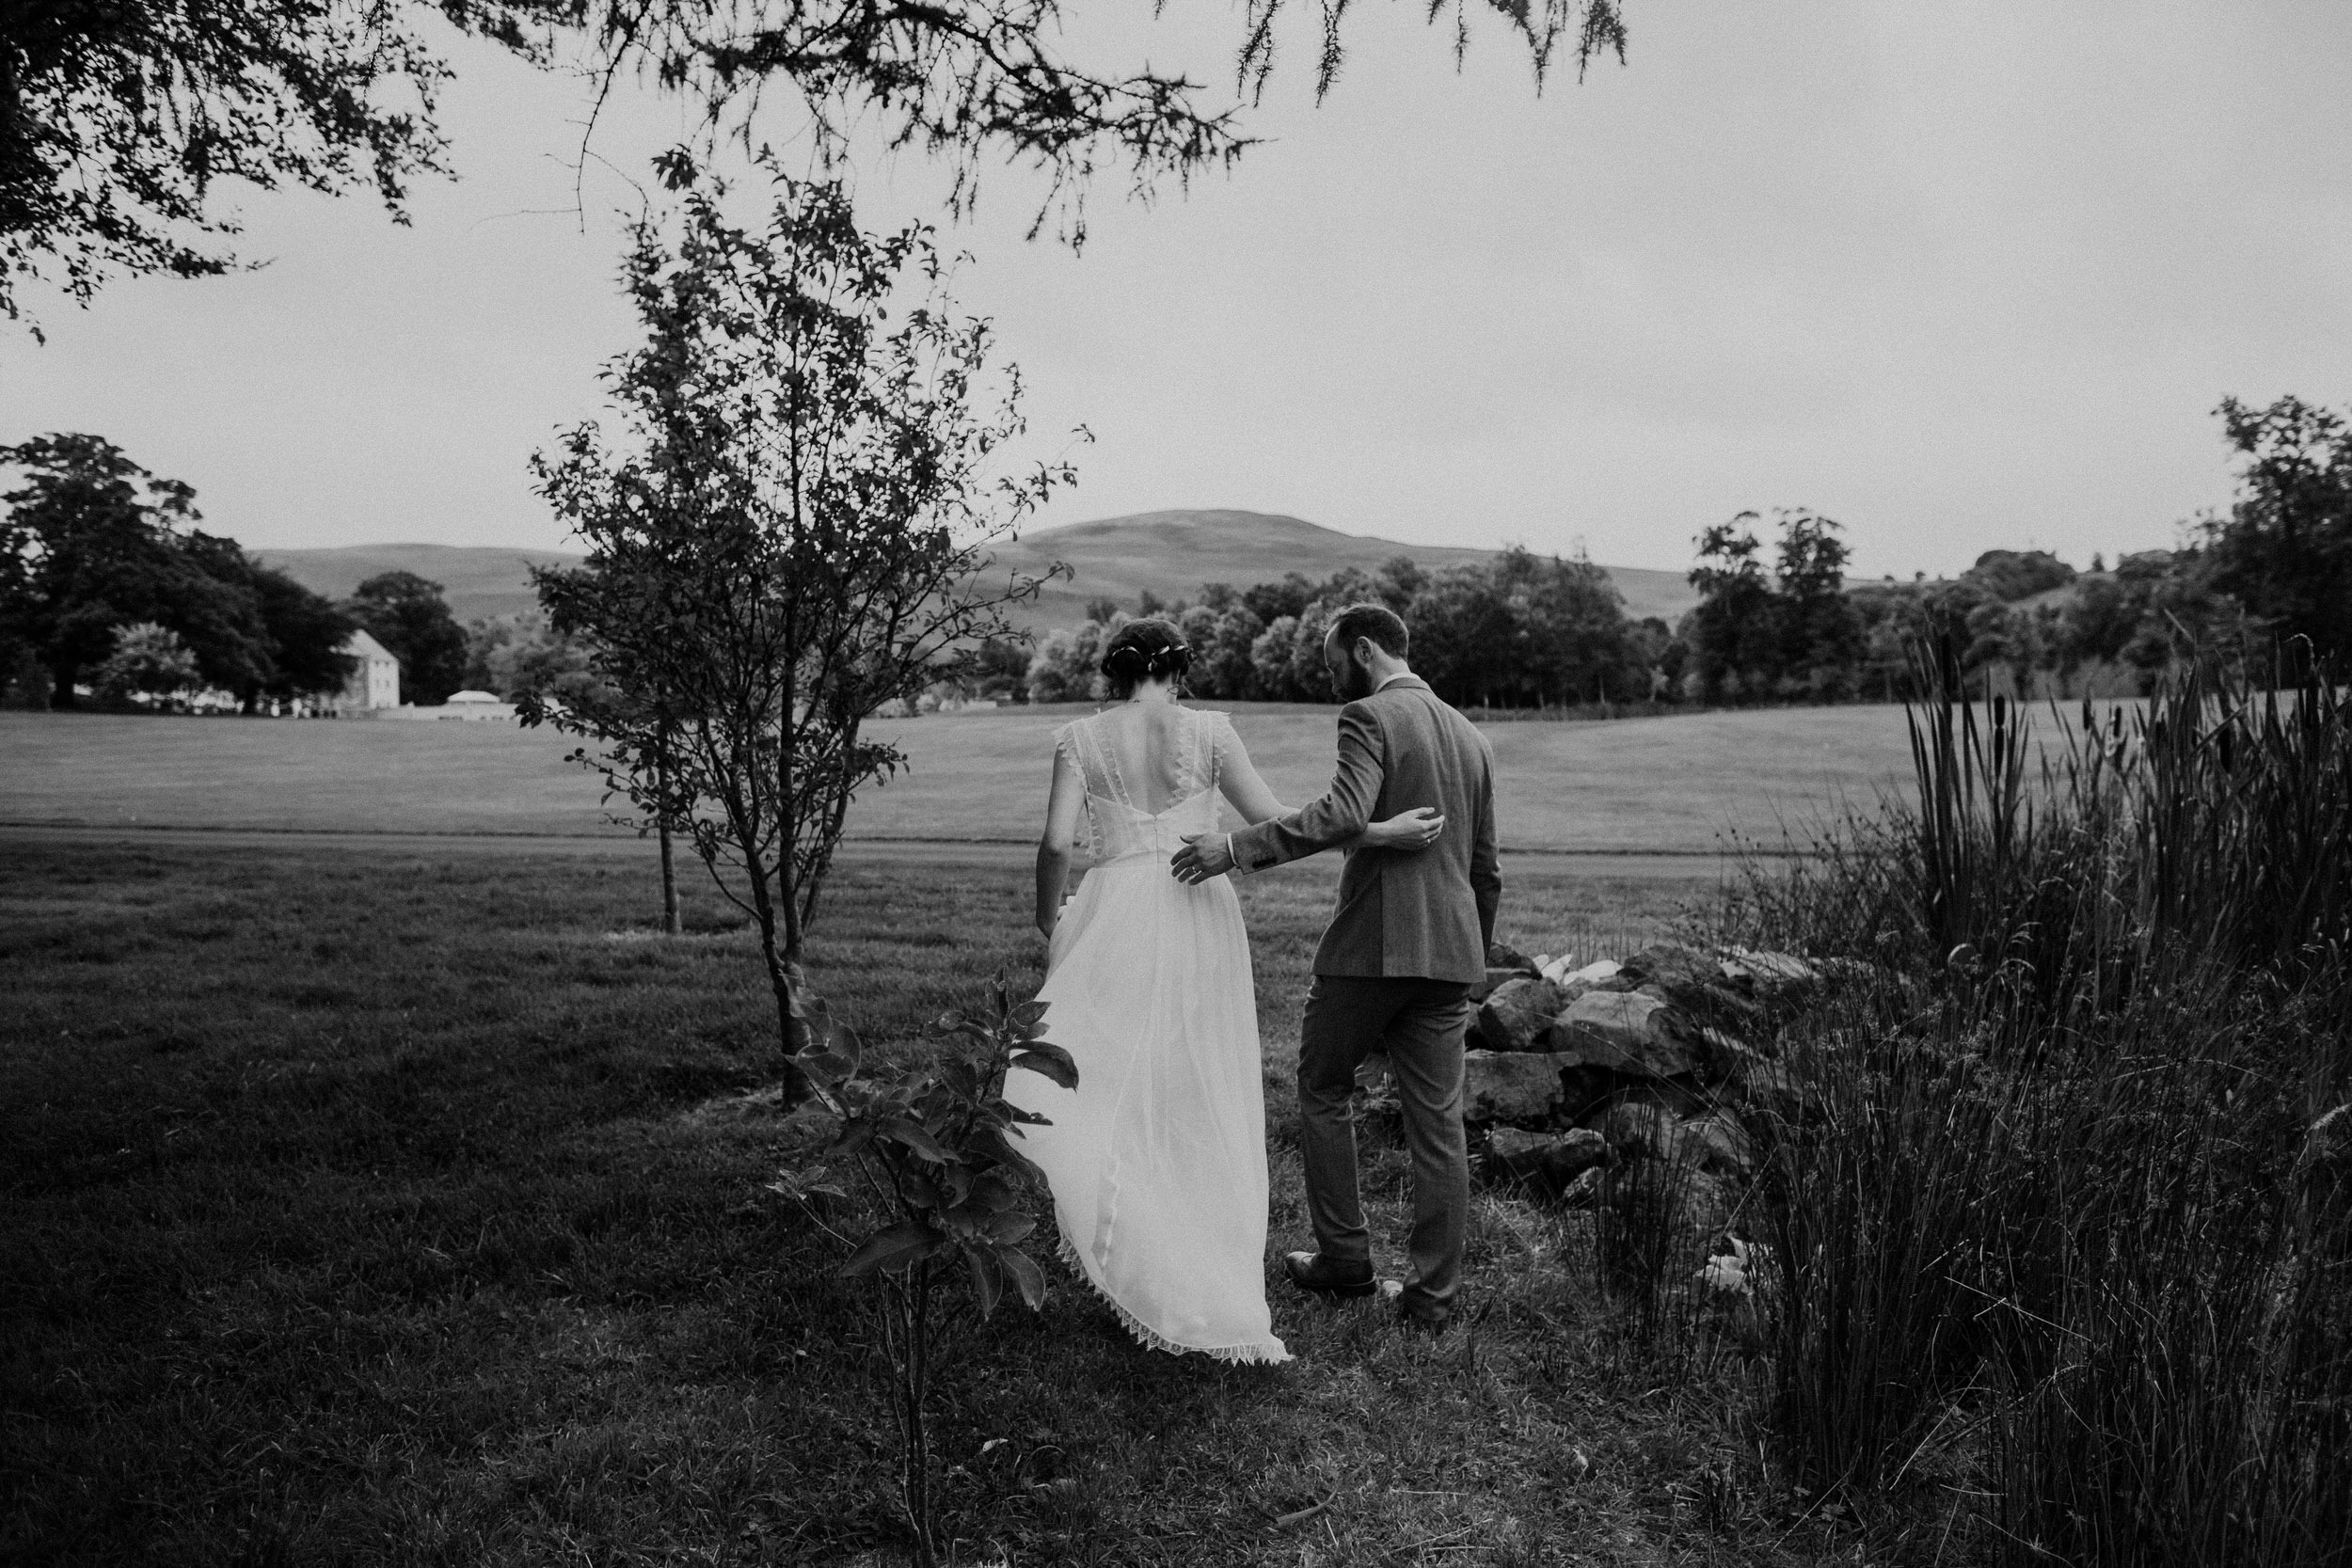 Quirky Wedding Photography Scotland Borders Biggar Hartree 069.jpg